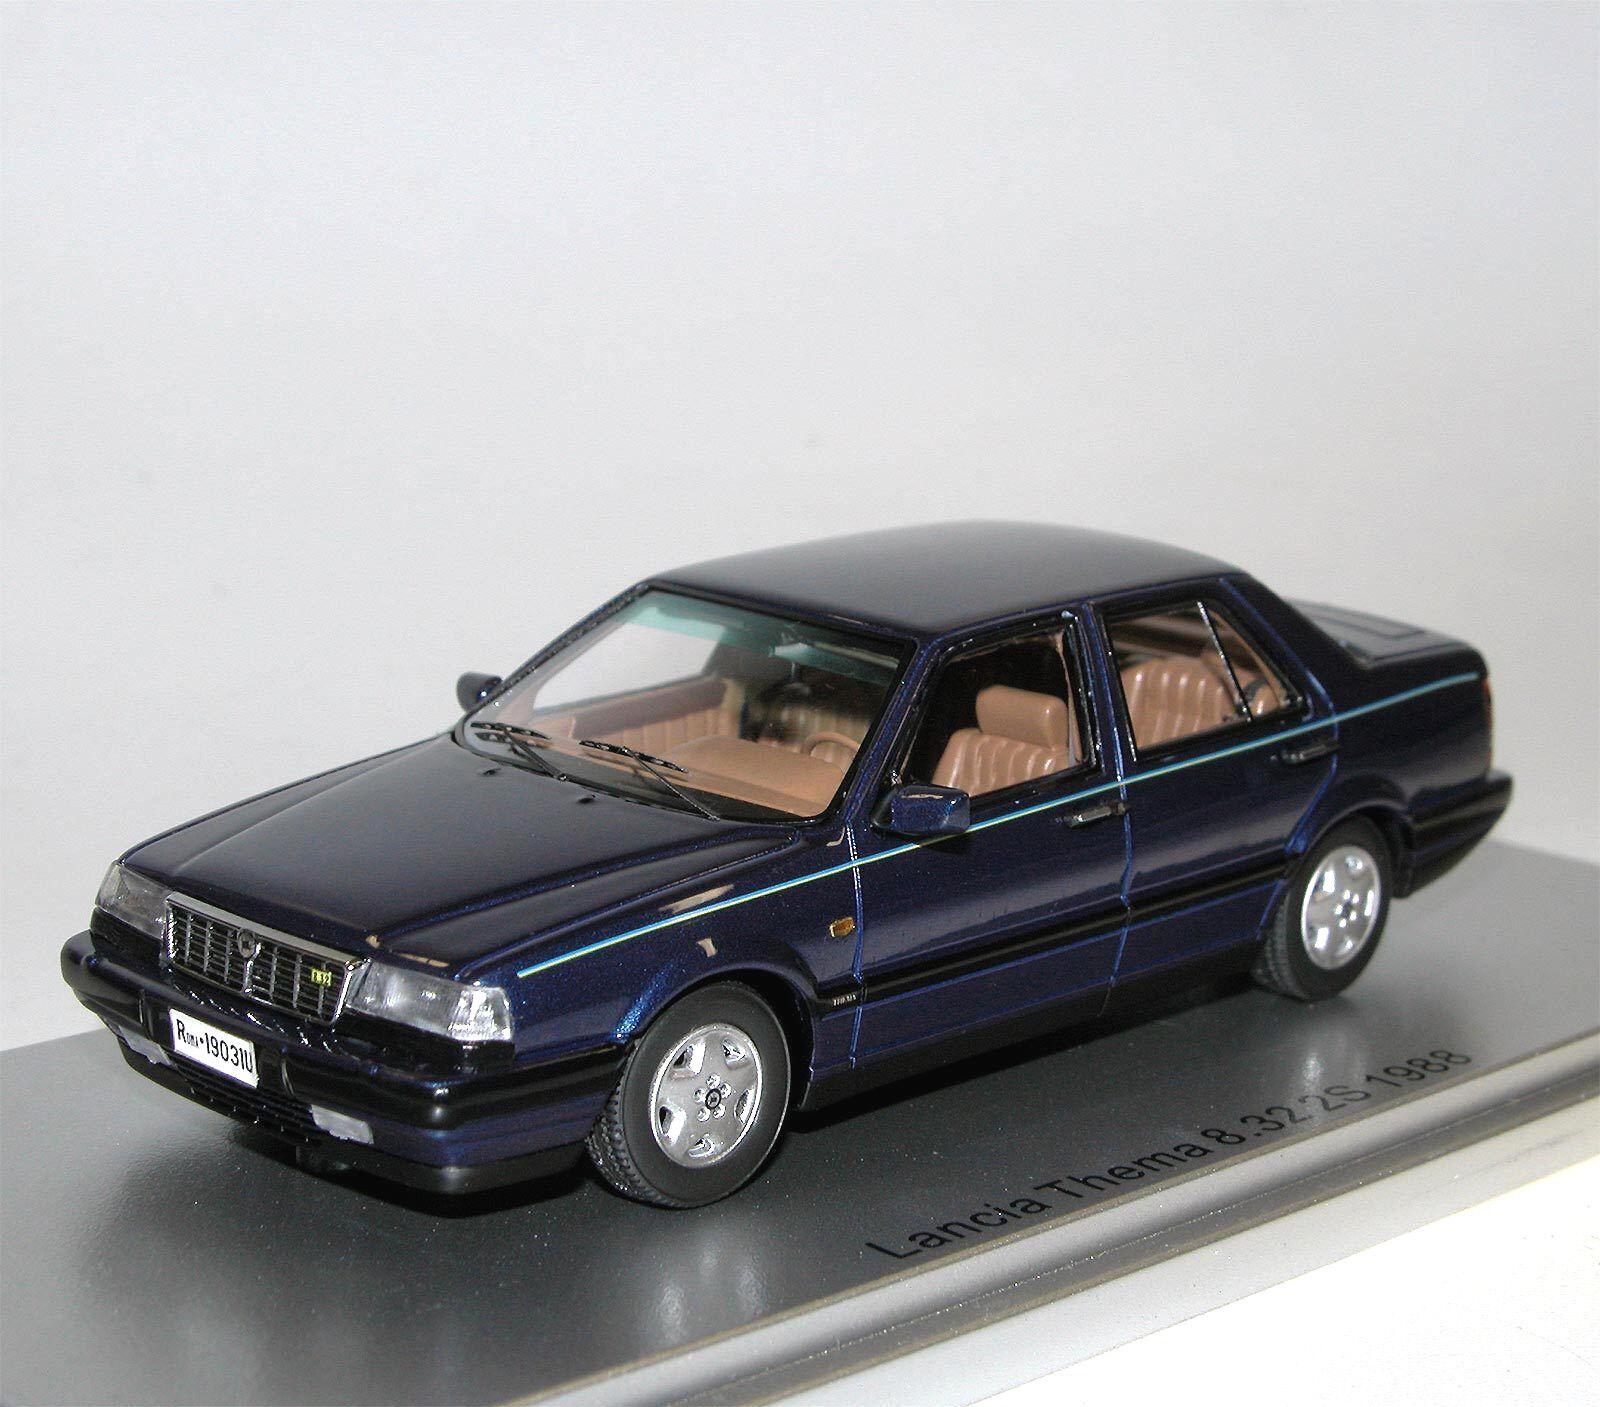 Kess scale models 1988 Lancia tema 8.32 2s blu Blizzard metalizado blu 1 43